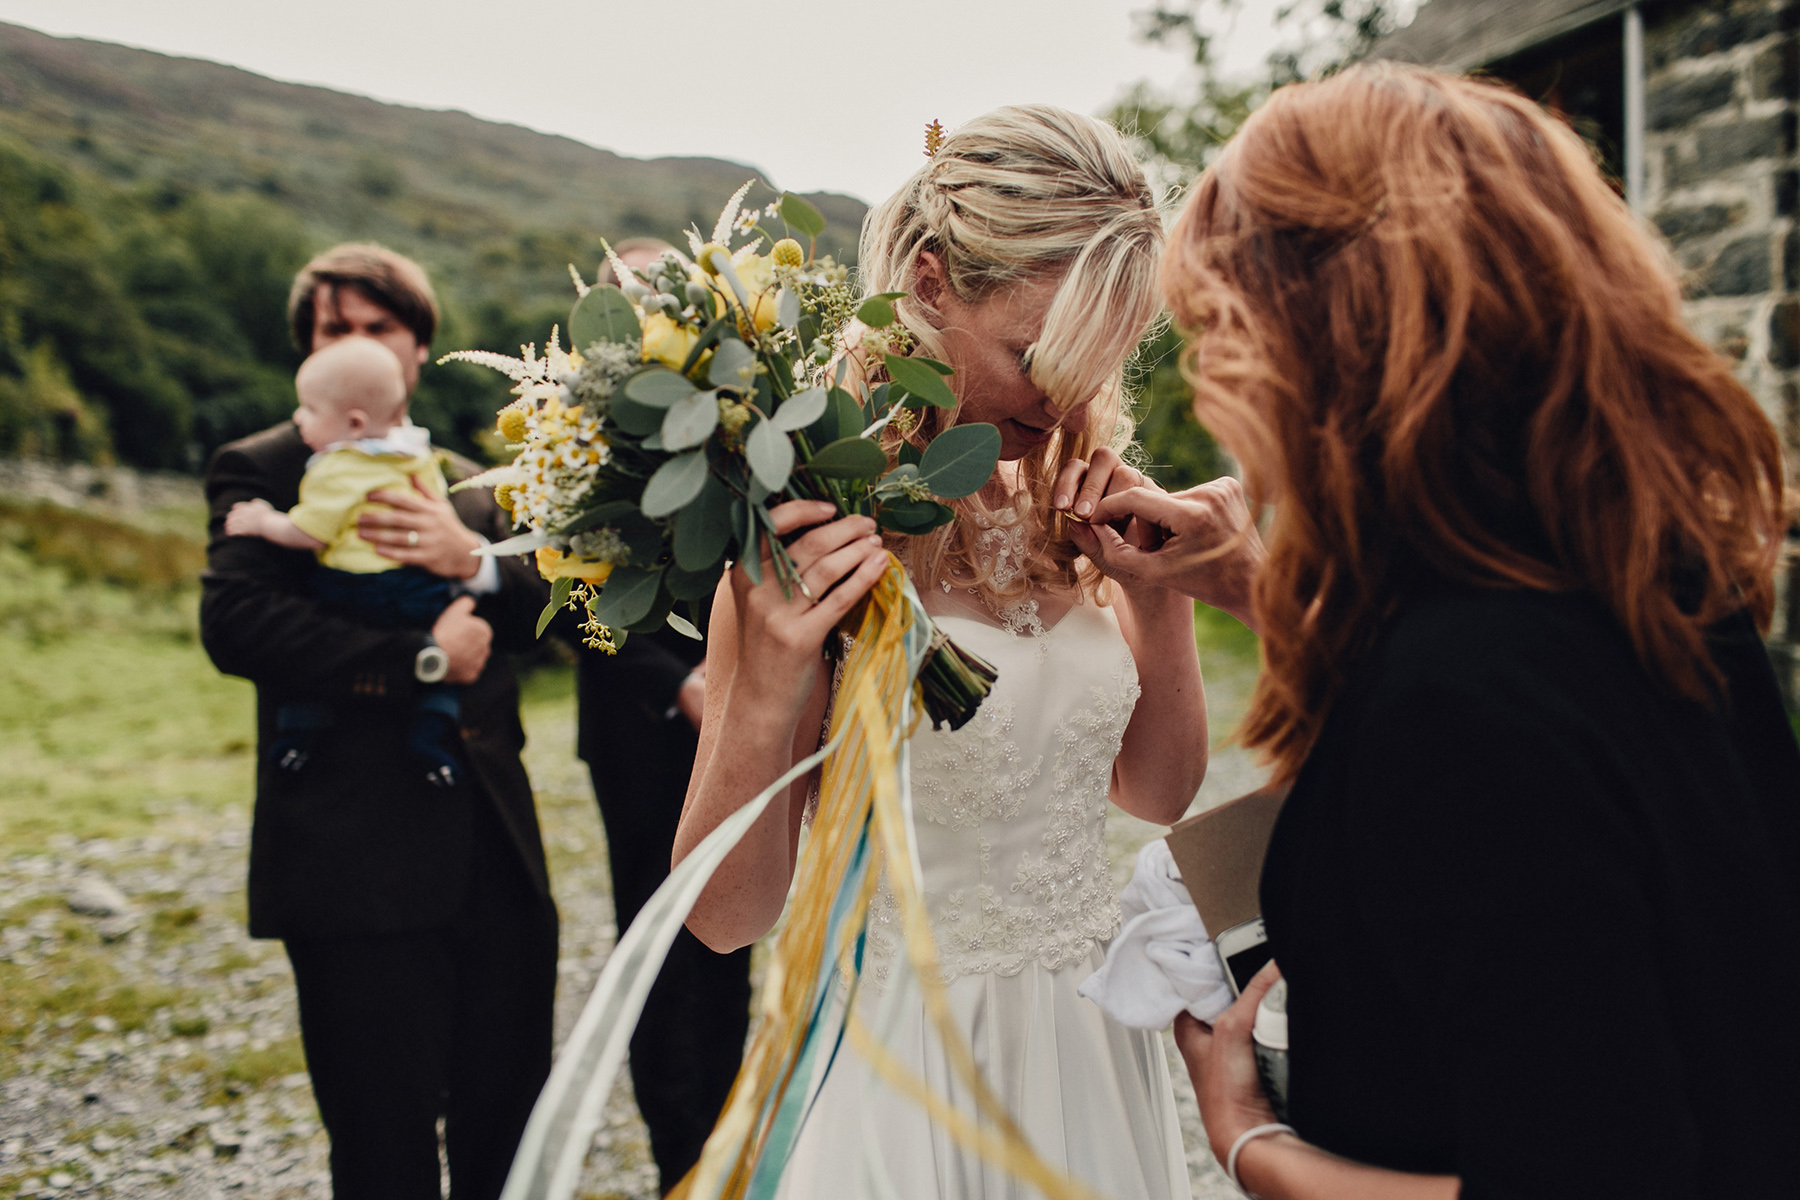 Snowdonia-Wales-Wedding-Photos-0332.jpg